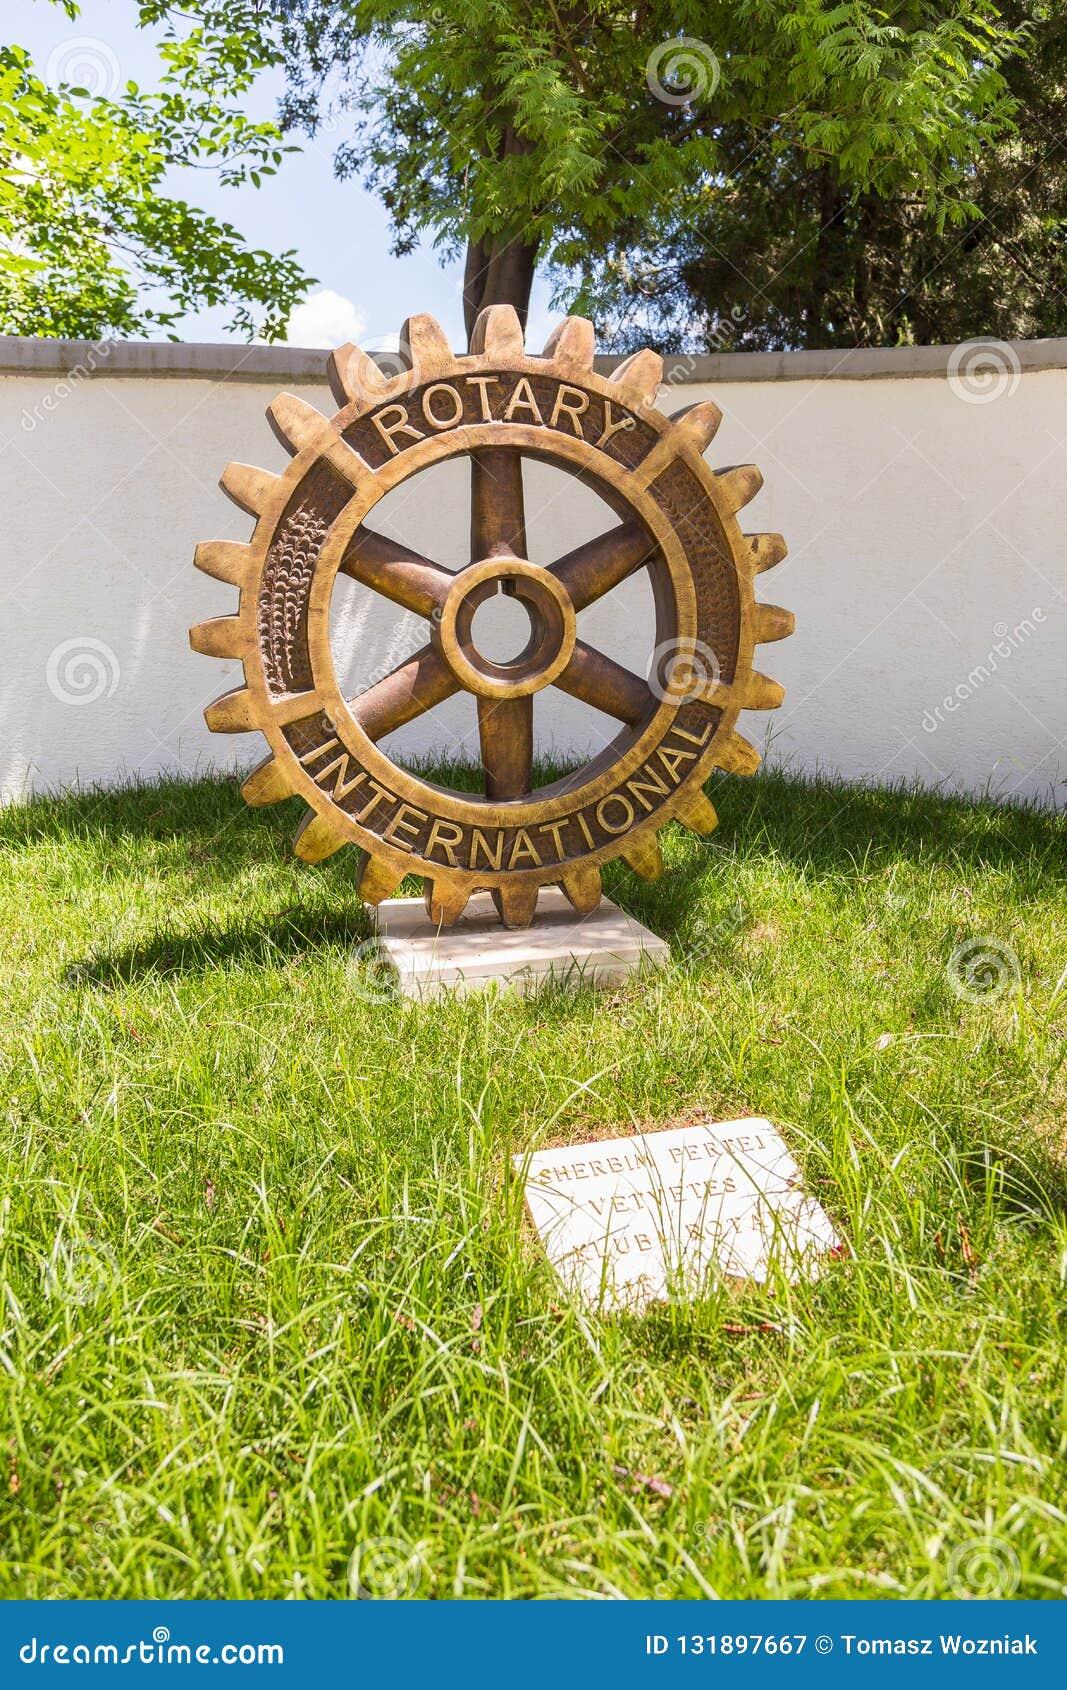 Памятник роторного клуба в центре Тирана, Албании